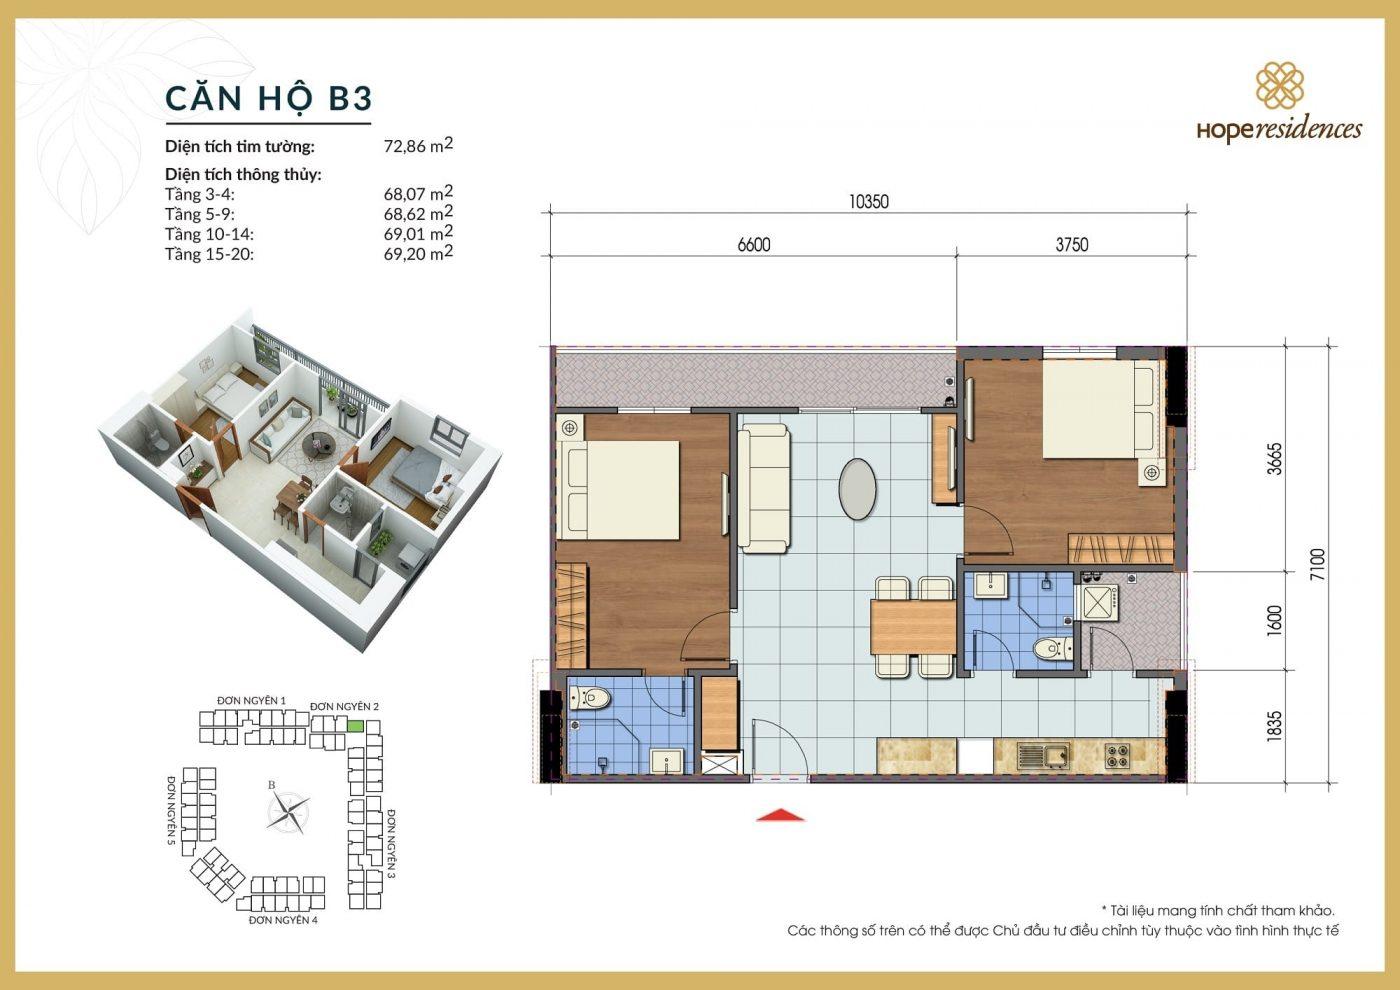 mat bang thiet ke can ho b3 hope residences